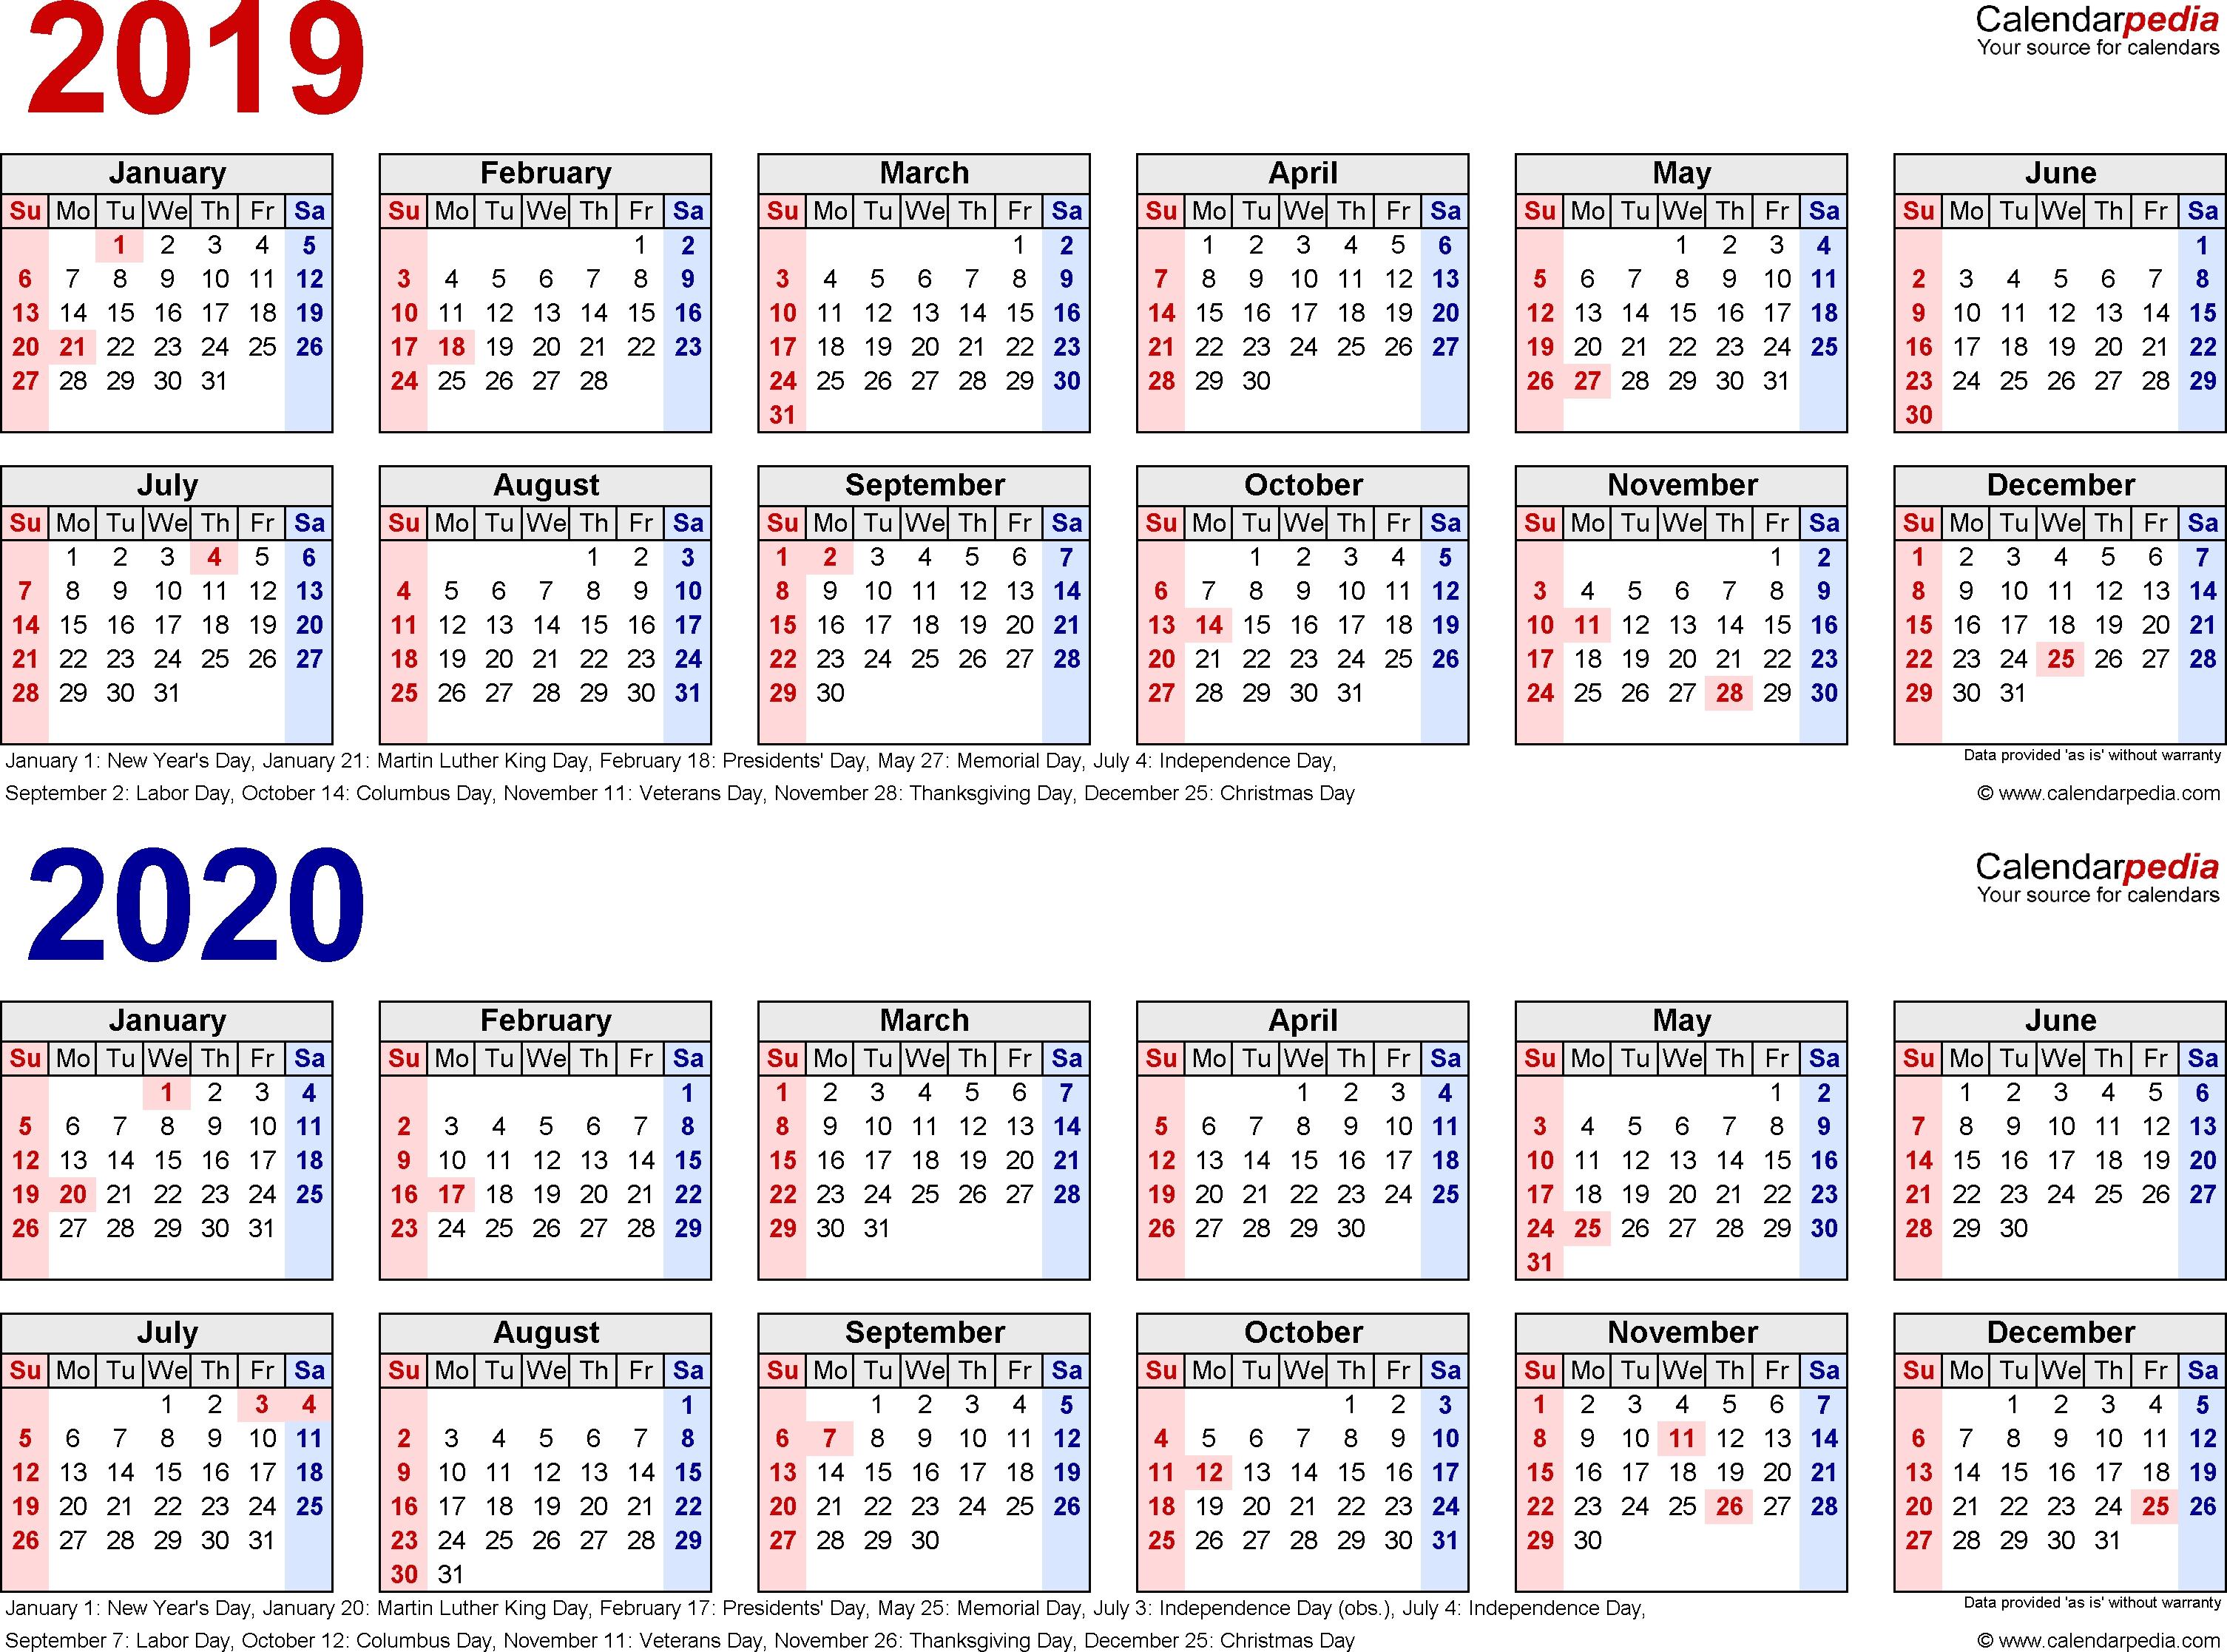 2019-2020 Calendar - Free Printable Two-Year Pdf Calendars intended for Weekly Free Print Calendar 2019 2020